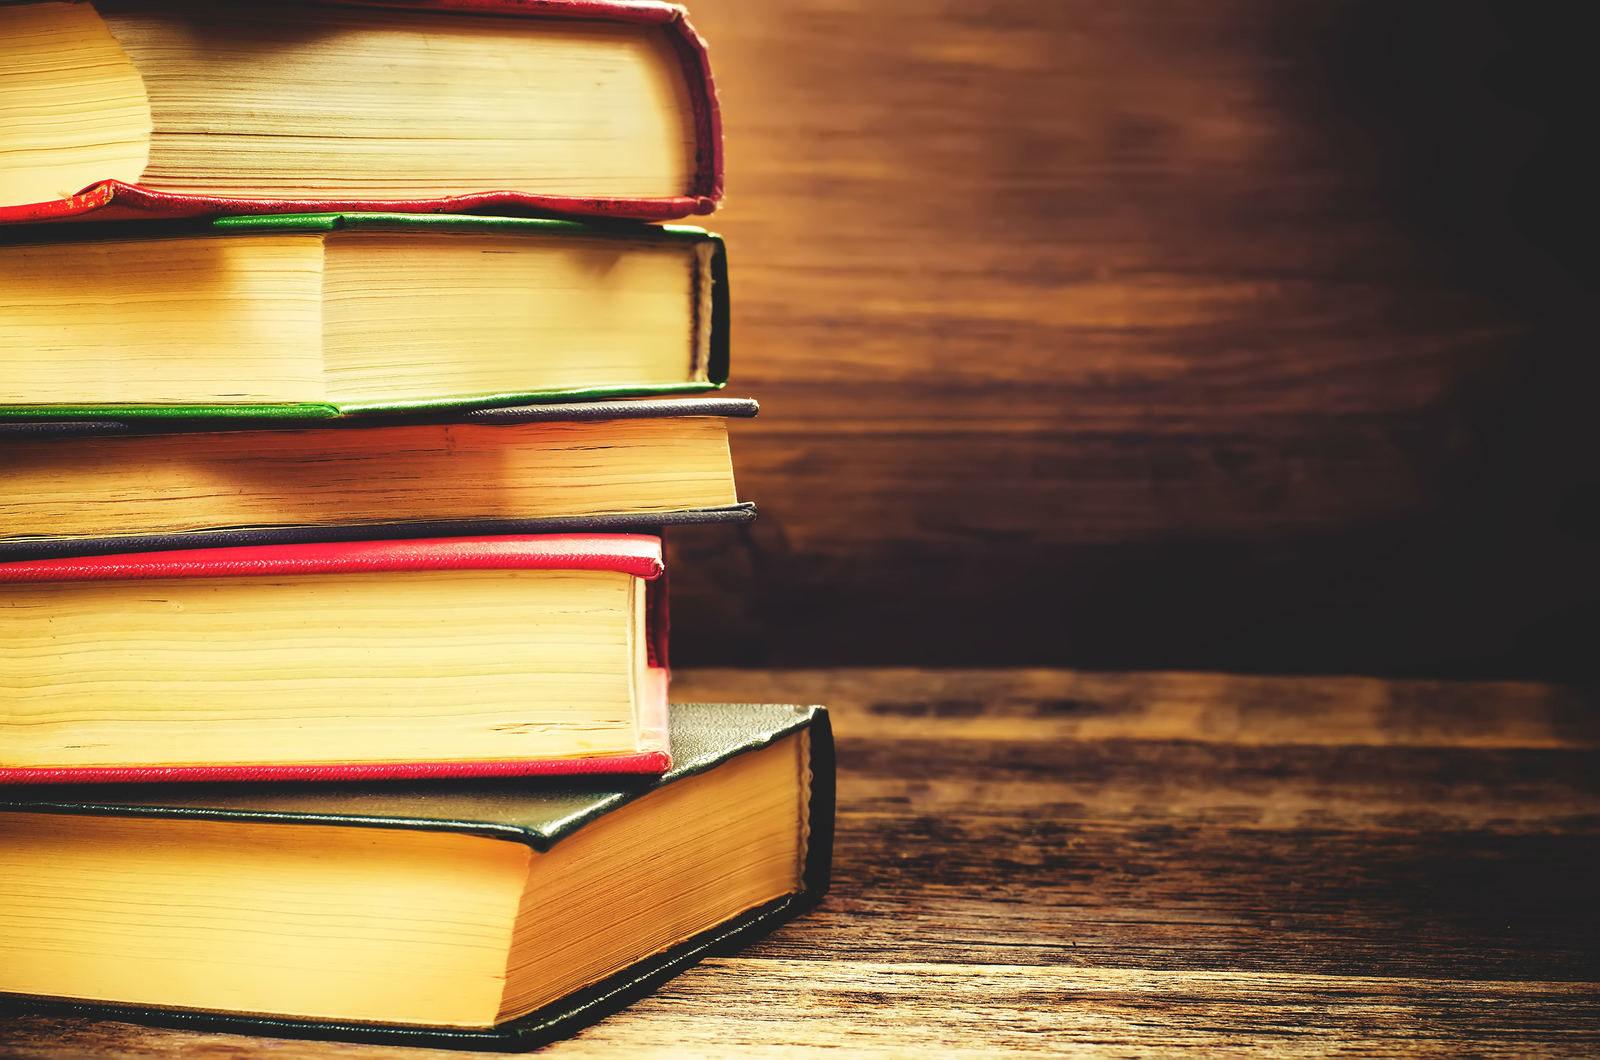 hevesli-kitap-okumak